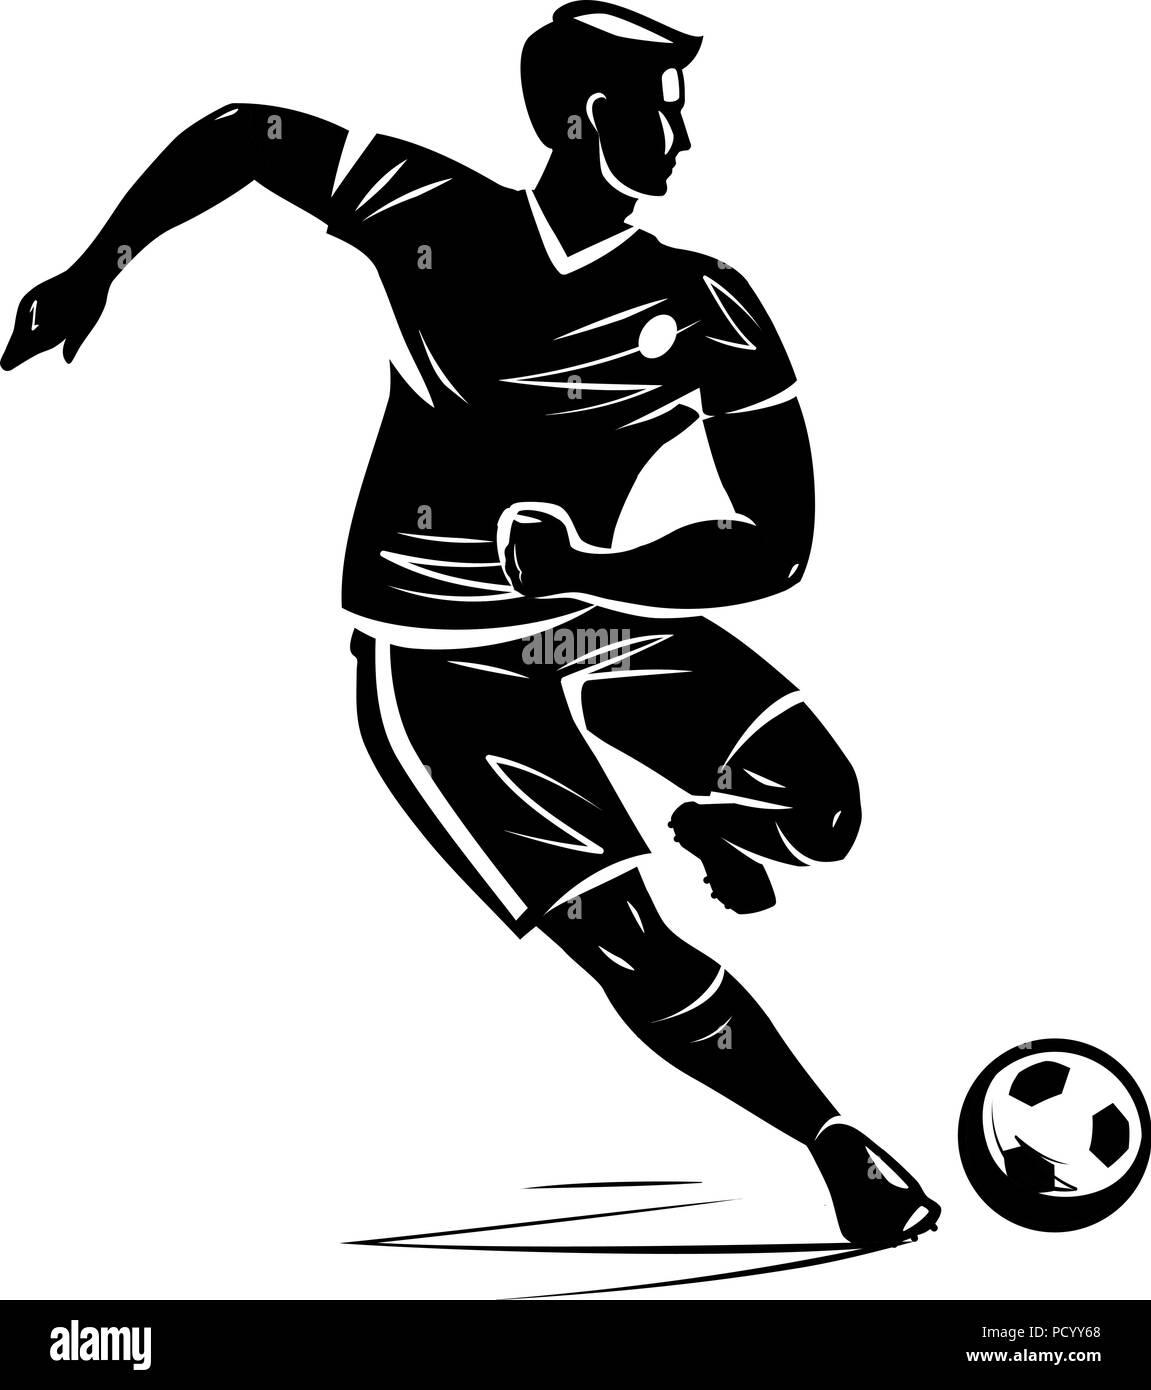 Soccer player, silhouette. Vector illustration - Stock Image